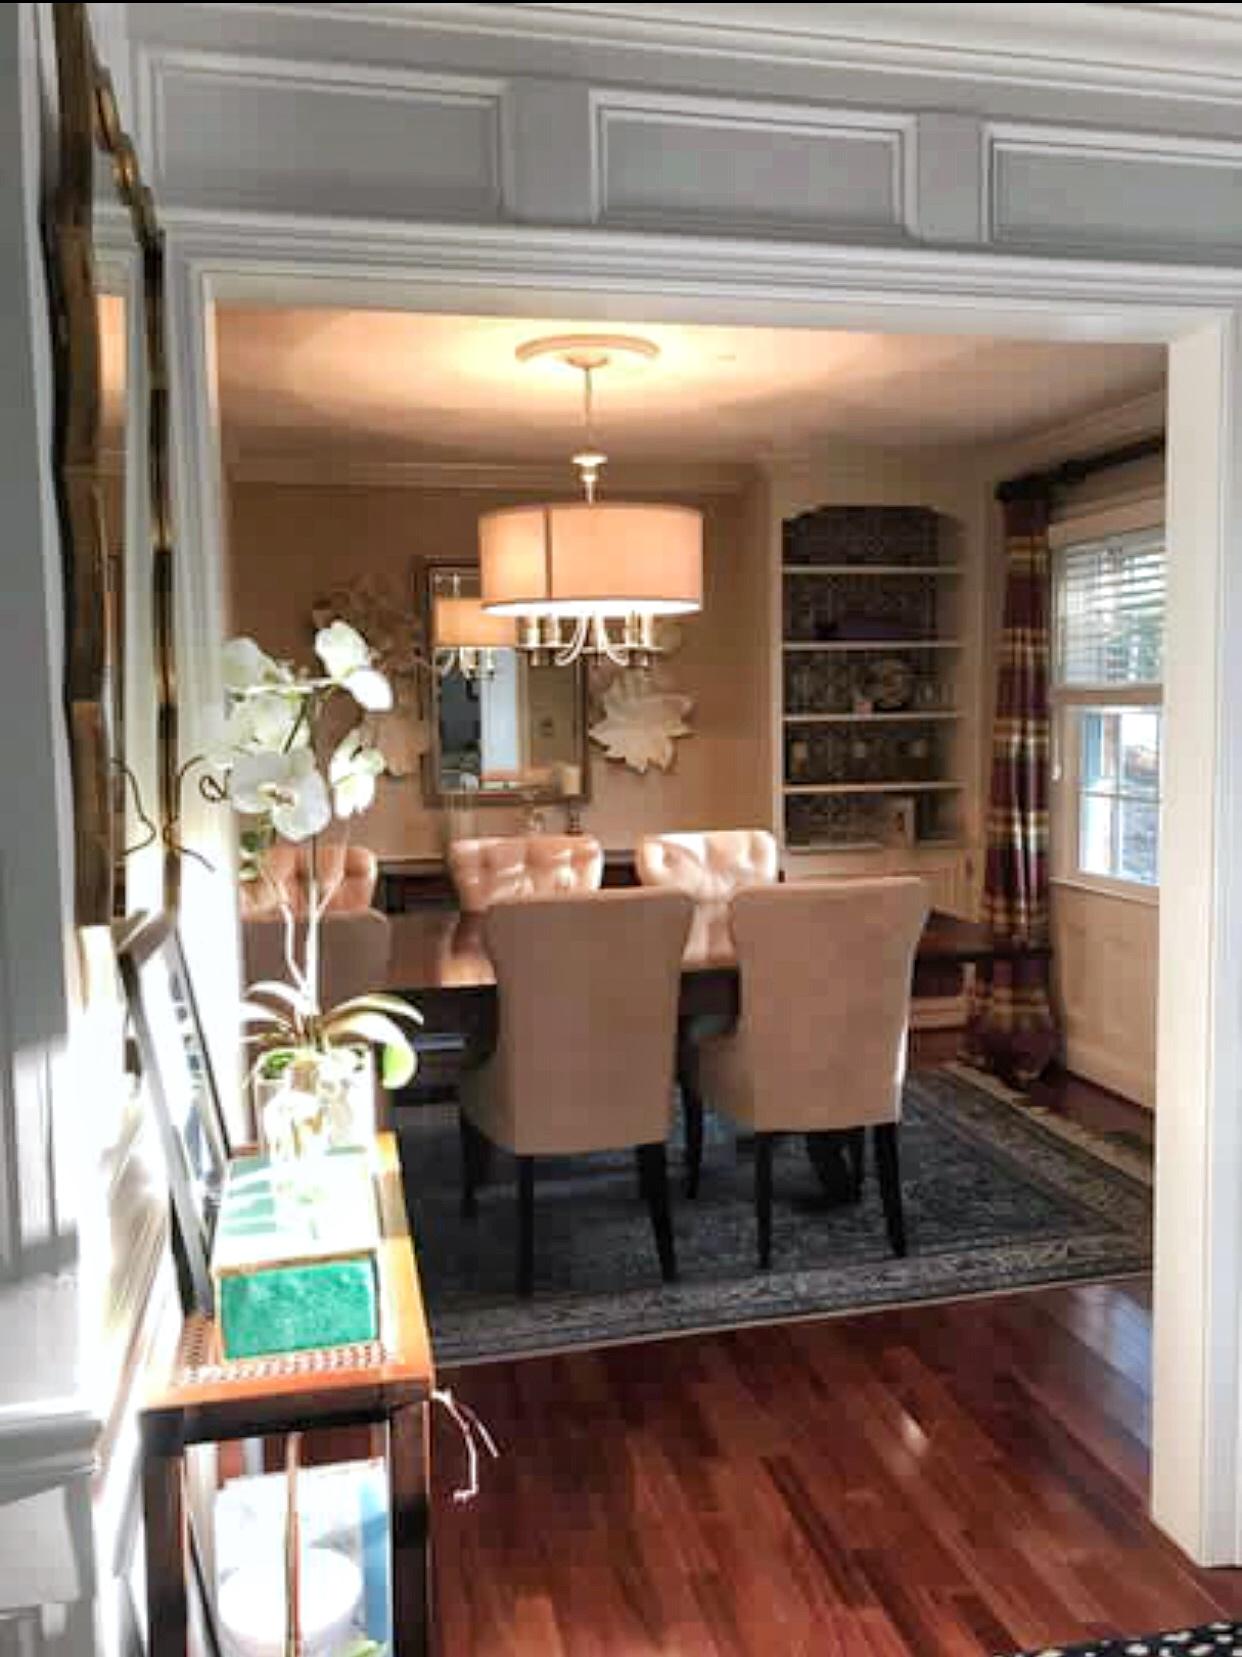 Hallway to Dining Room Transition Jana Donohoe Designs Fayetteville North Carolina 28301, 28303, 28304, 28305, 28306, 28307, 28308, 28310, 28311, 28312, 28314, 28390, 28395.  .jpeg